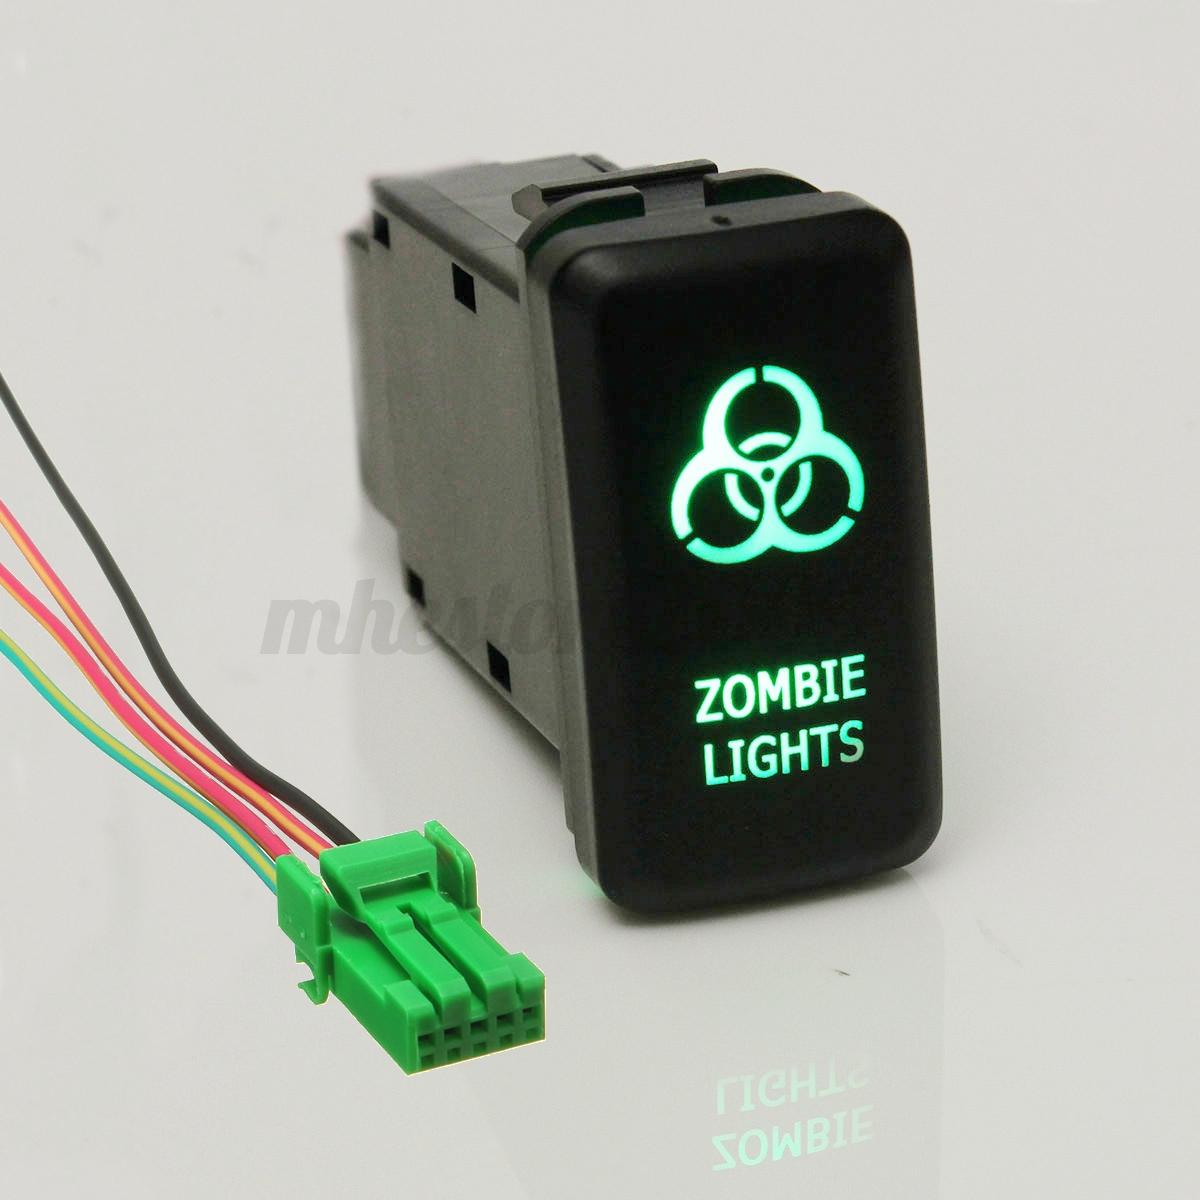 Green Led Zombie Light Push Switch 12v For Toyota Landcruiser Hilux Rocker Wiring Diagram Image Is Loading